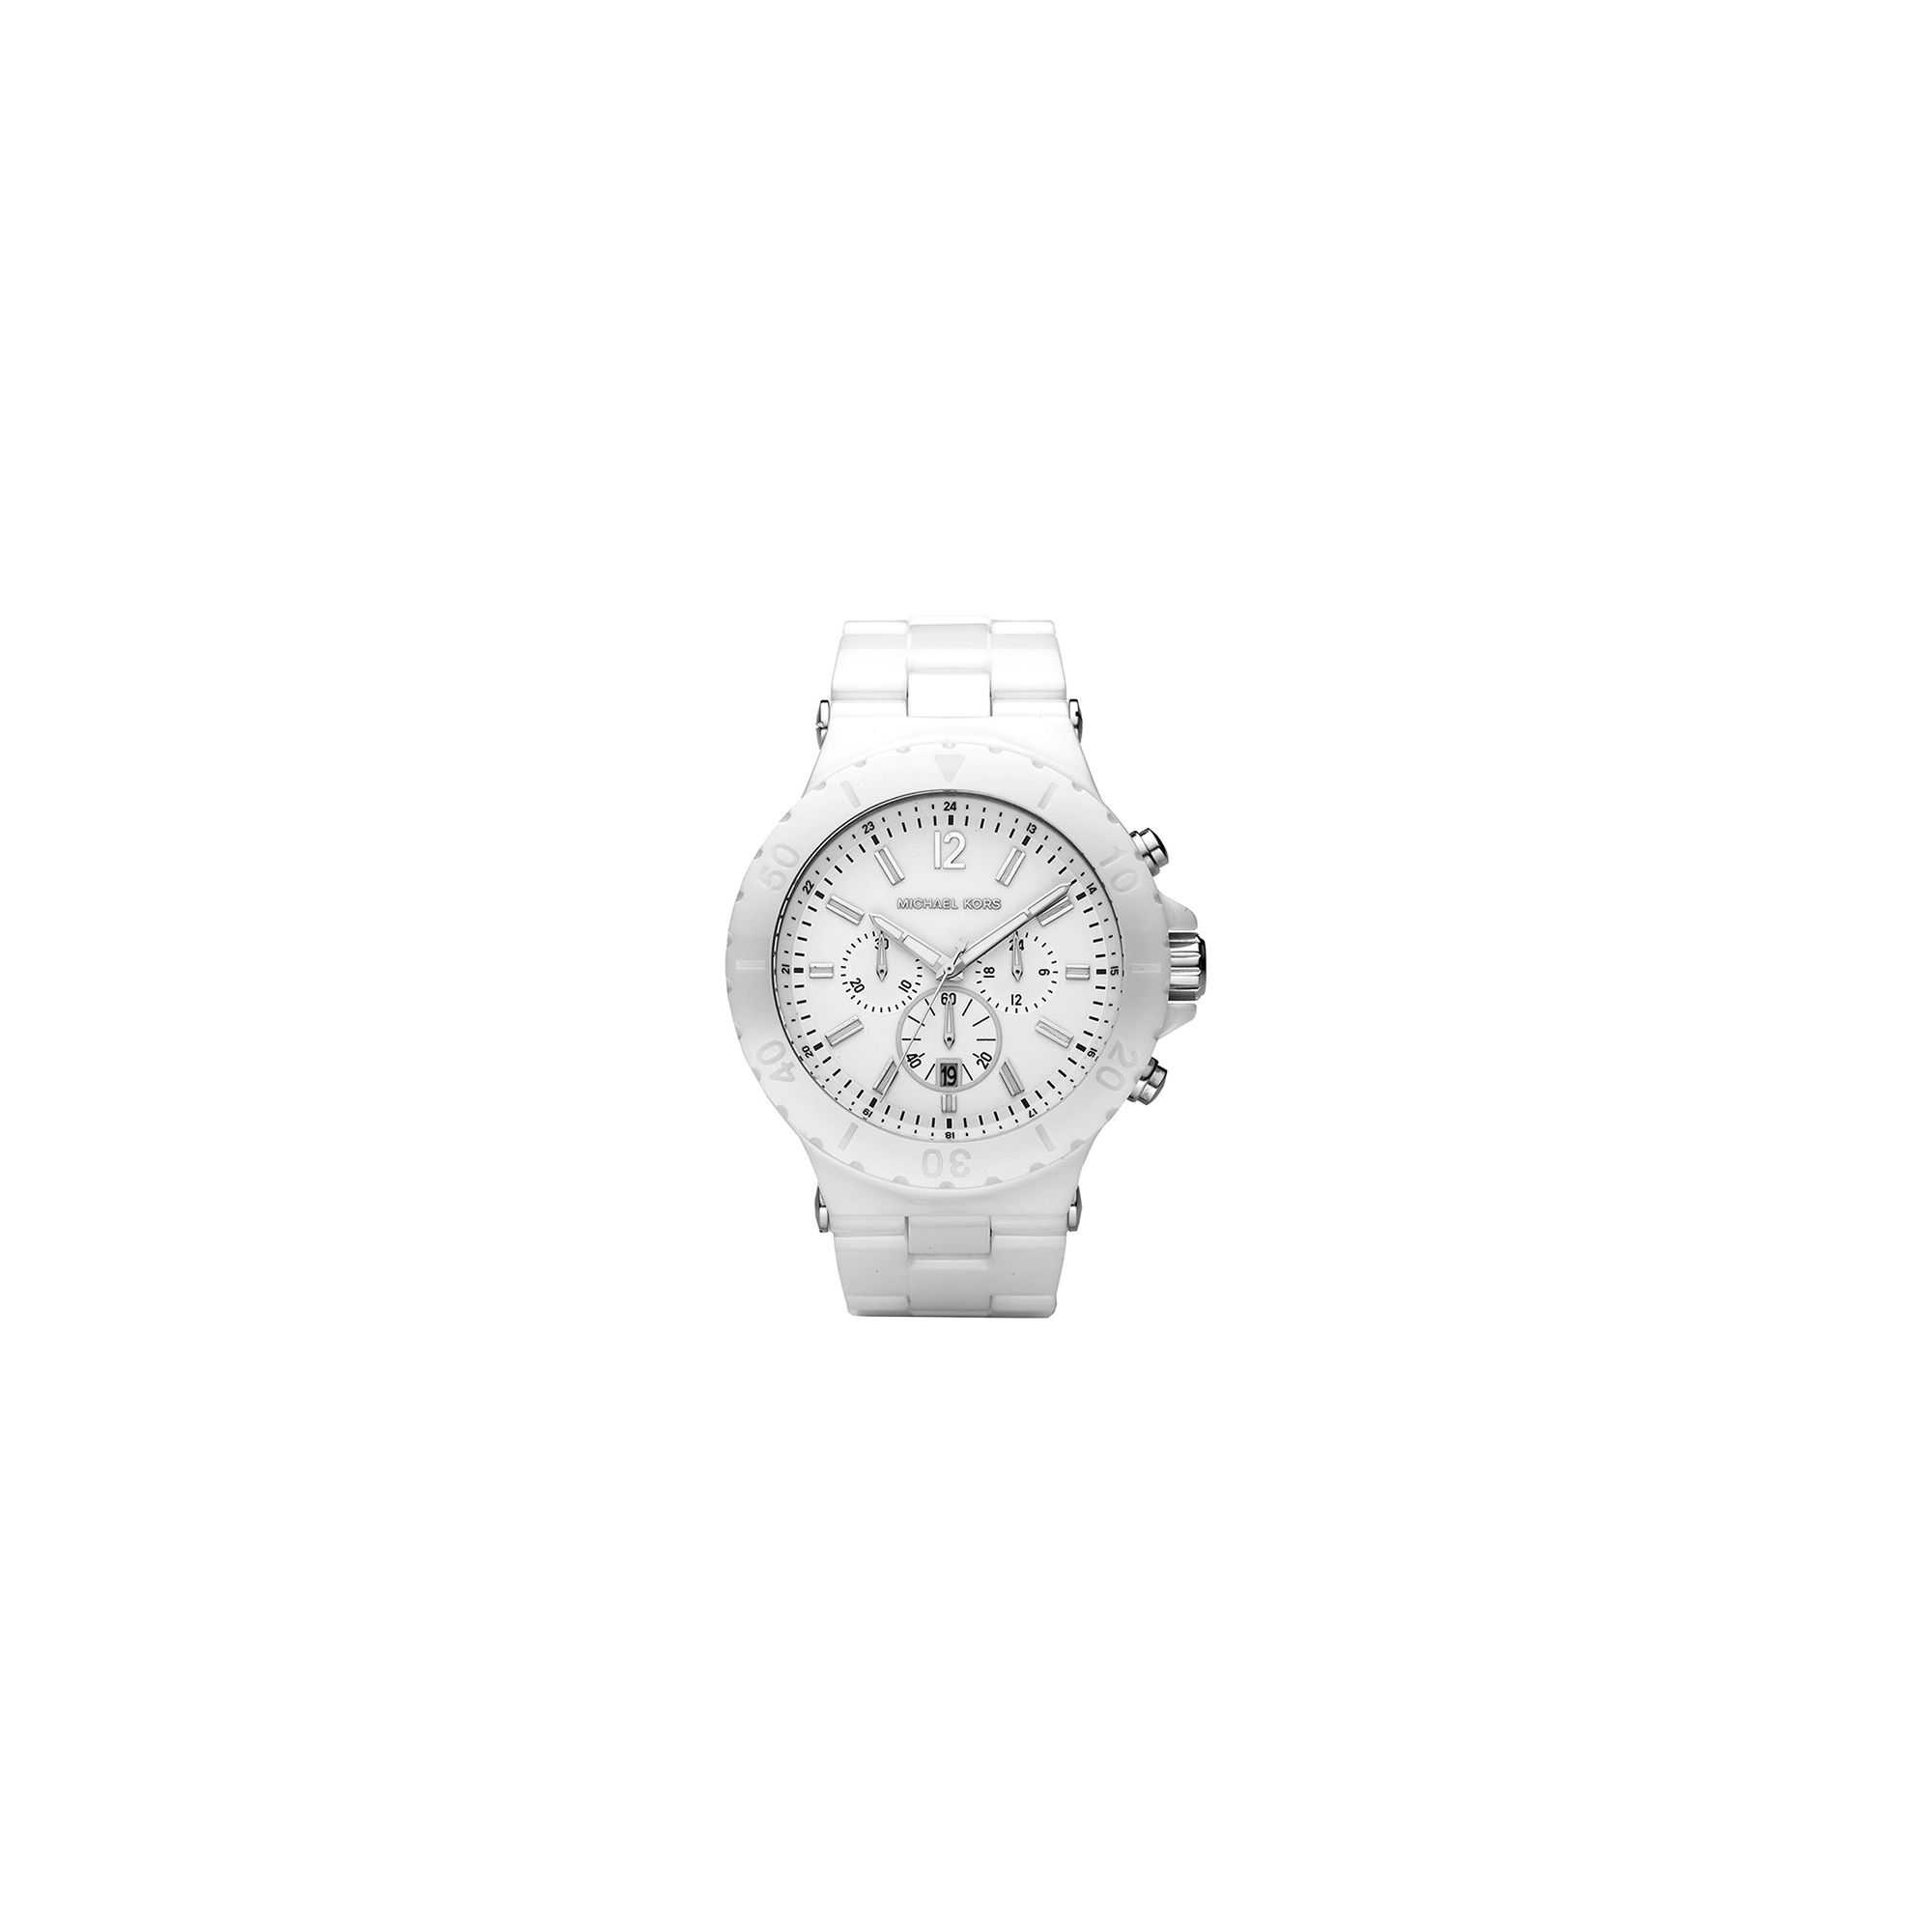 Michael Kors Unisex Ceramic Chronograph Watch MK8177 at Tesco Direct